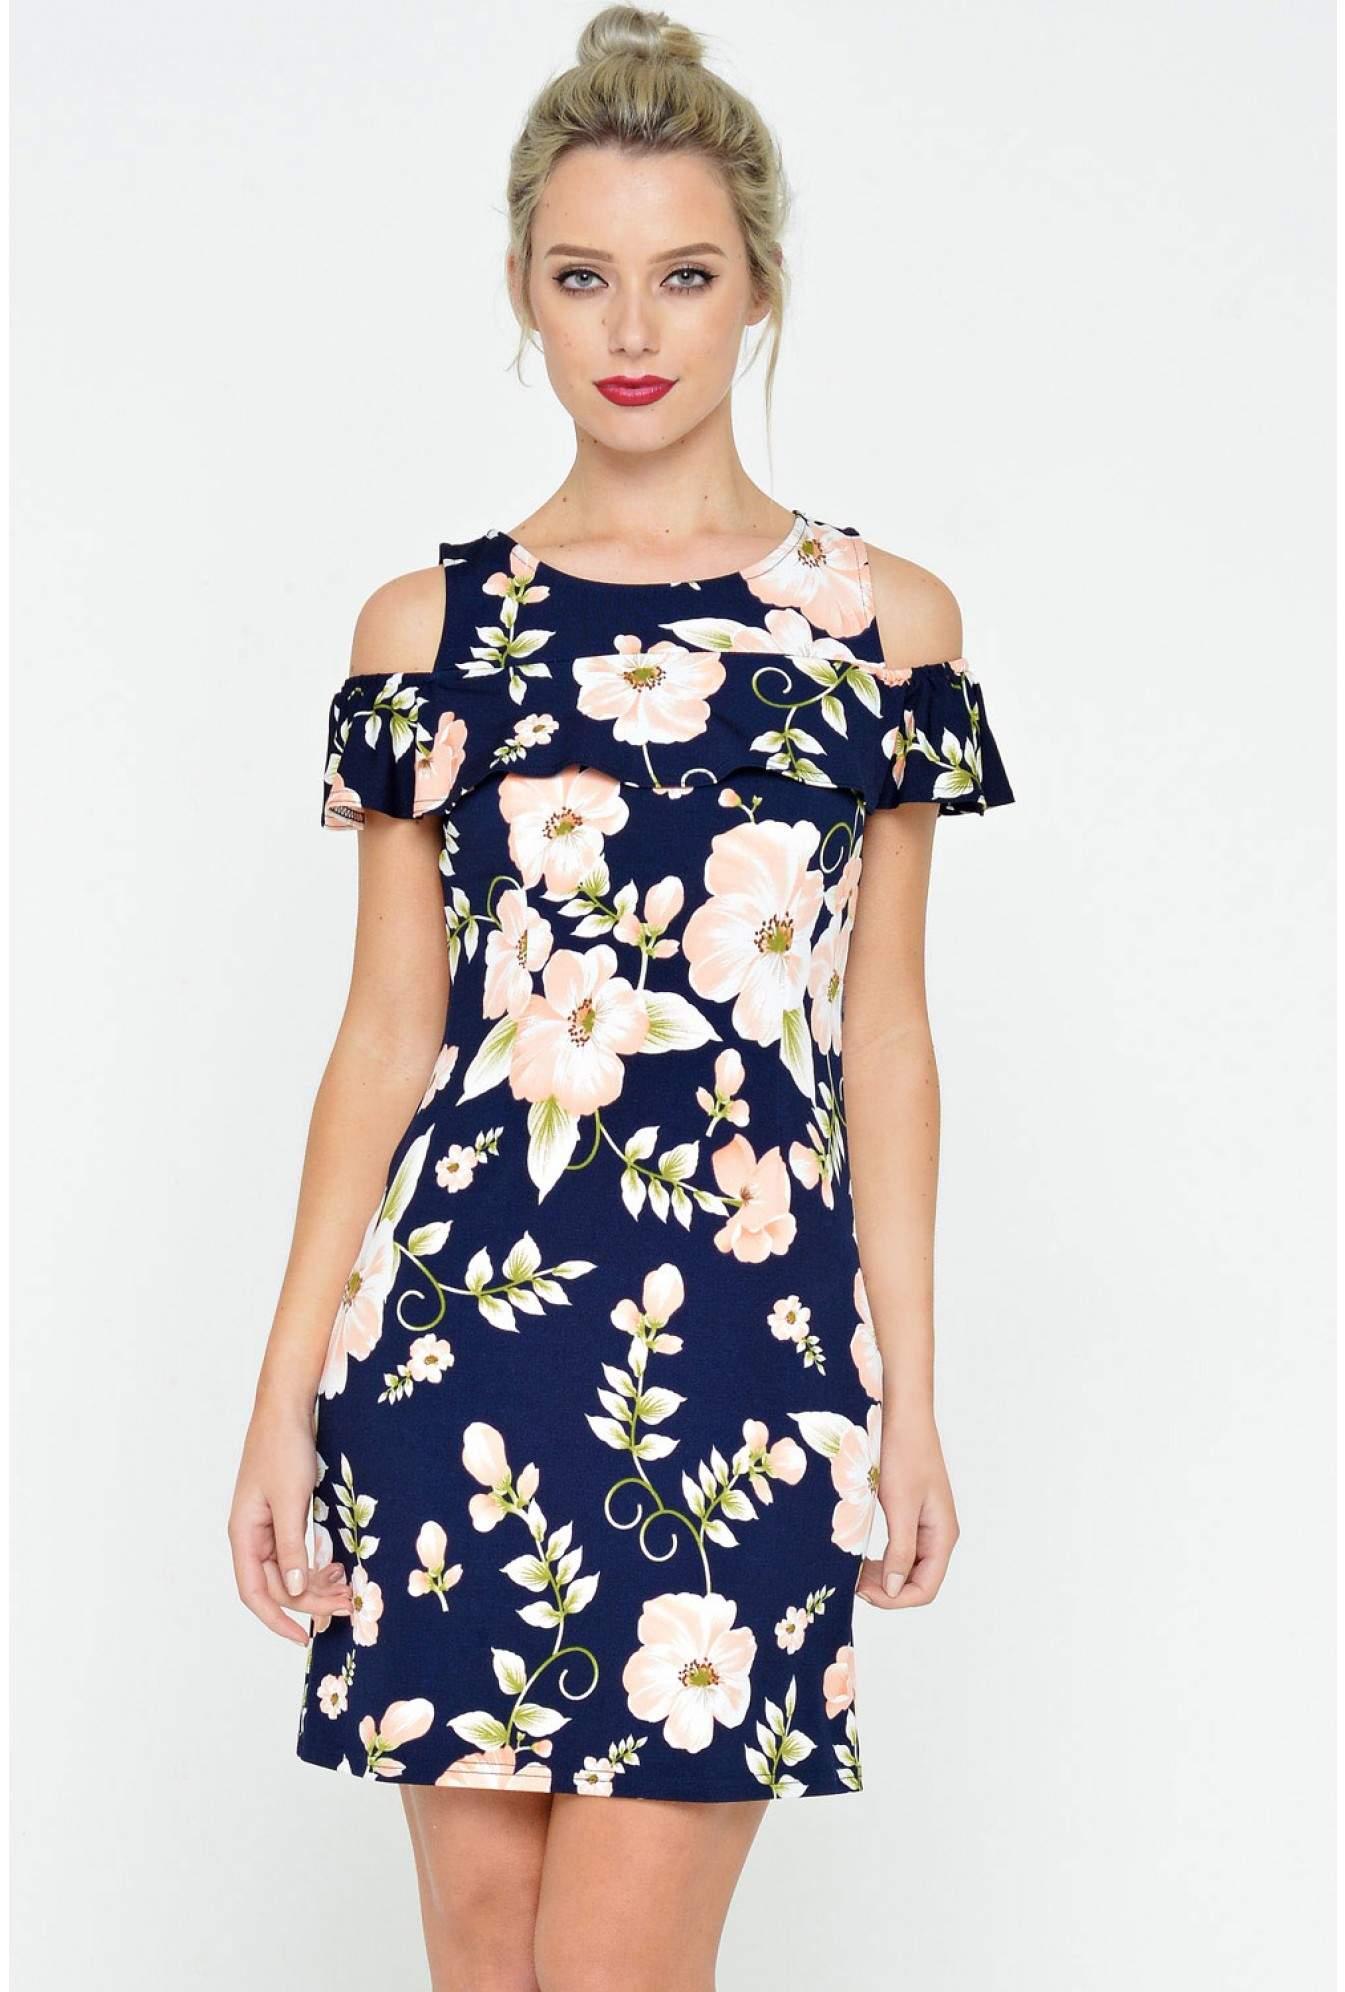 7517620d81c8 Stella Tina Floral Print Shift Dress in Multi Navy